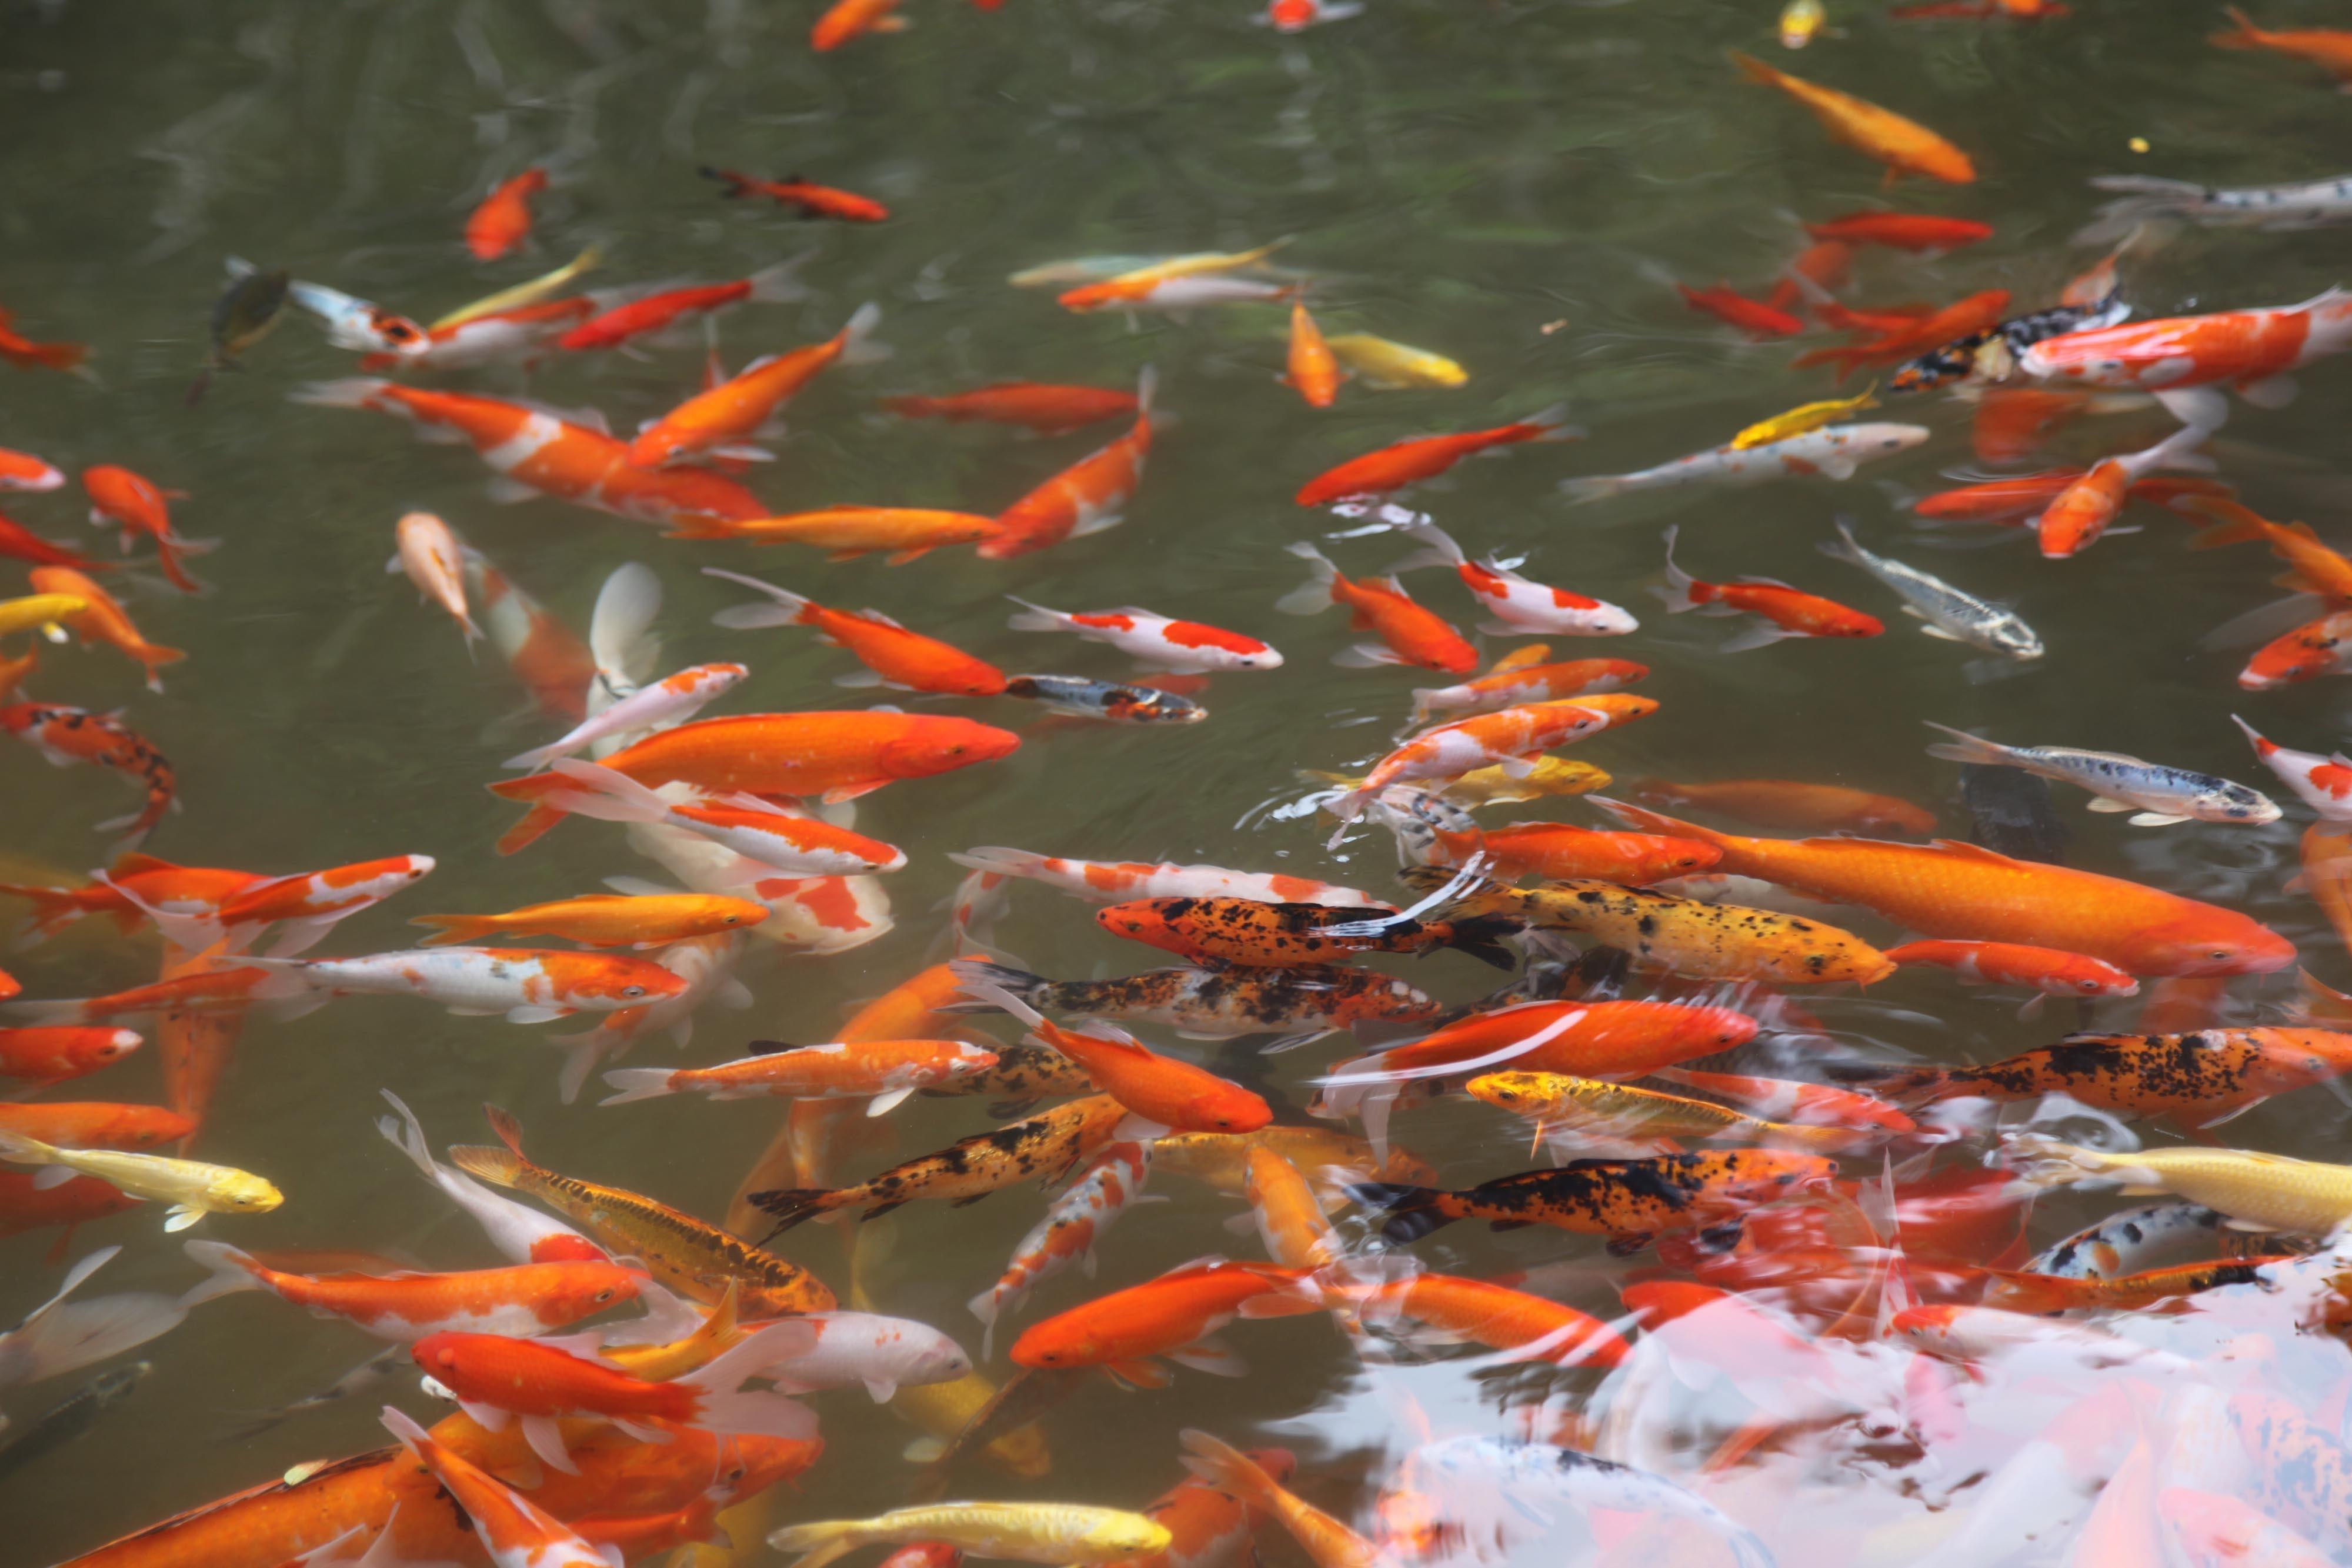 flor piscina estanque pescado alimentacin pez de colores koi estanque de peces fenmeno geolgico biologa marina